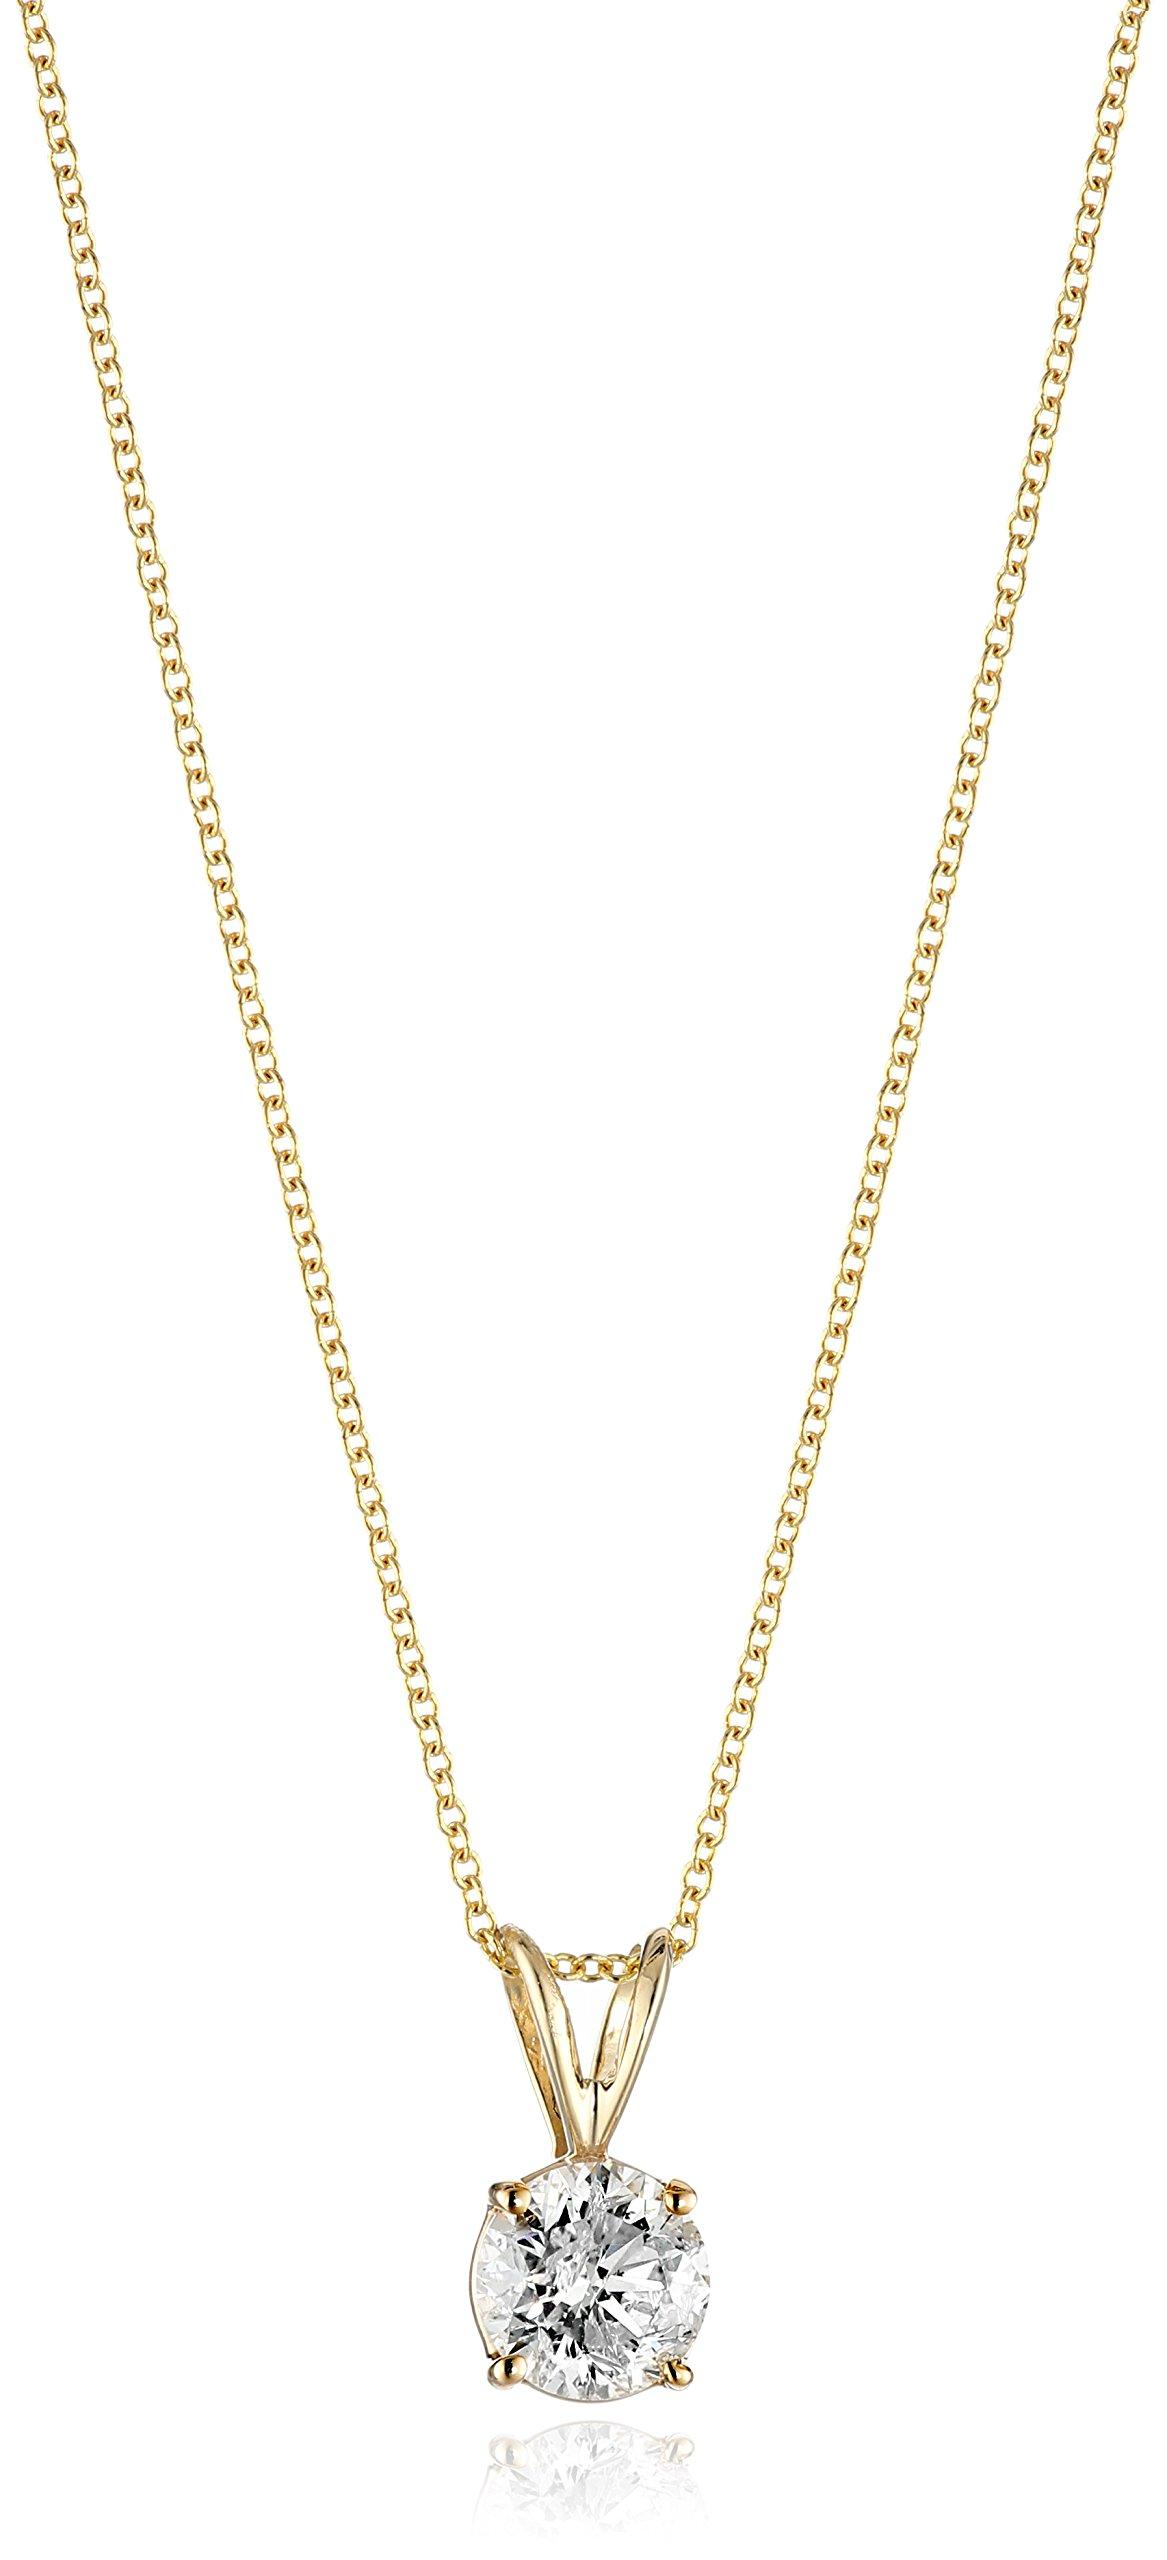 14k Gold Round-Cut Diamond Pendant Necklace (J-K Color, I2-I3 Clarity)